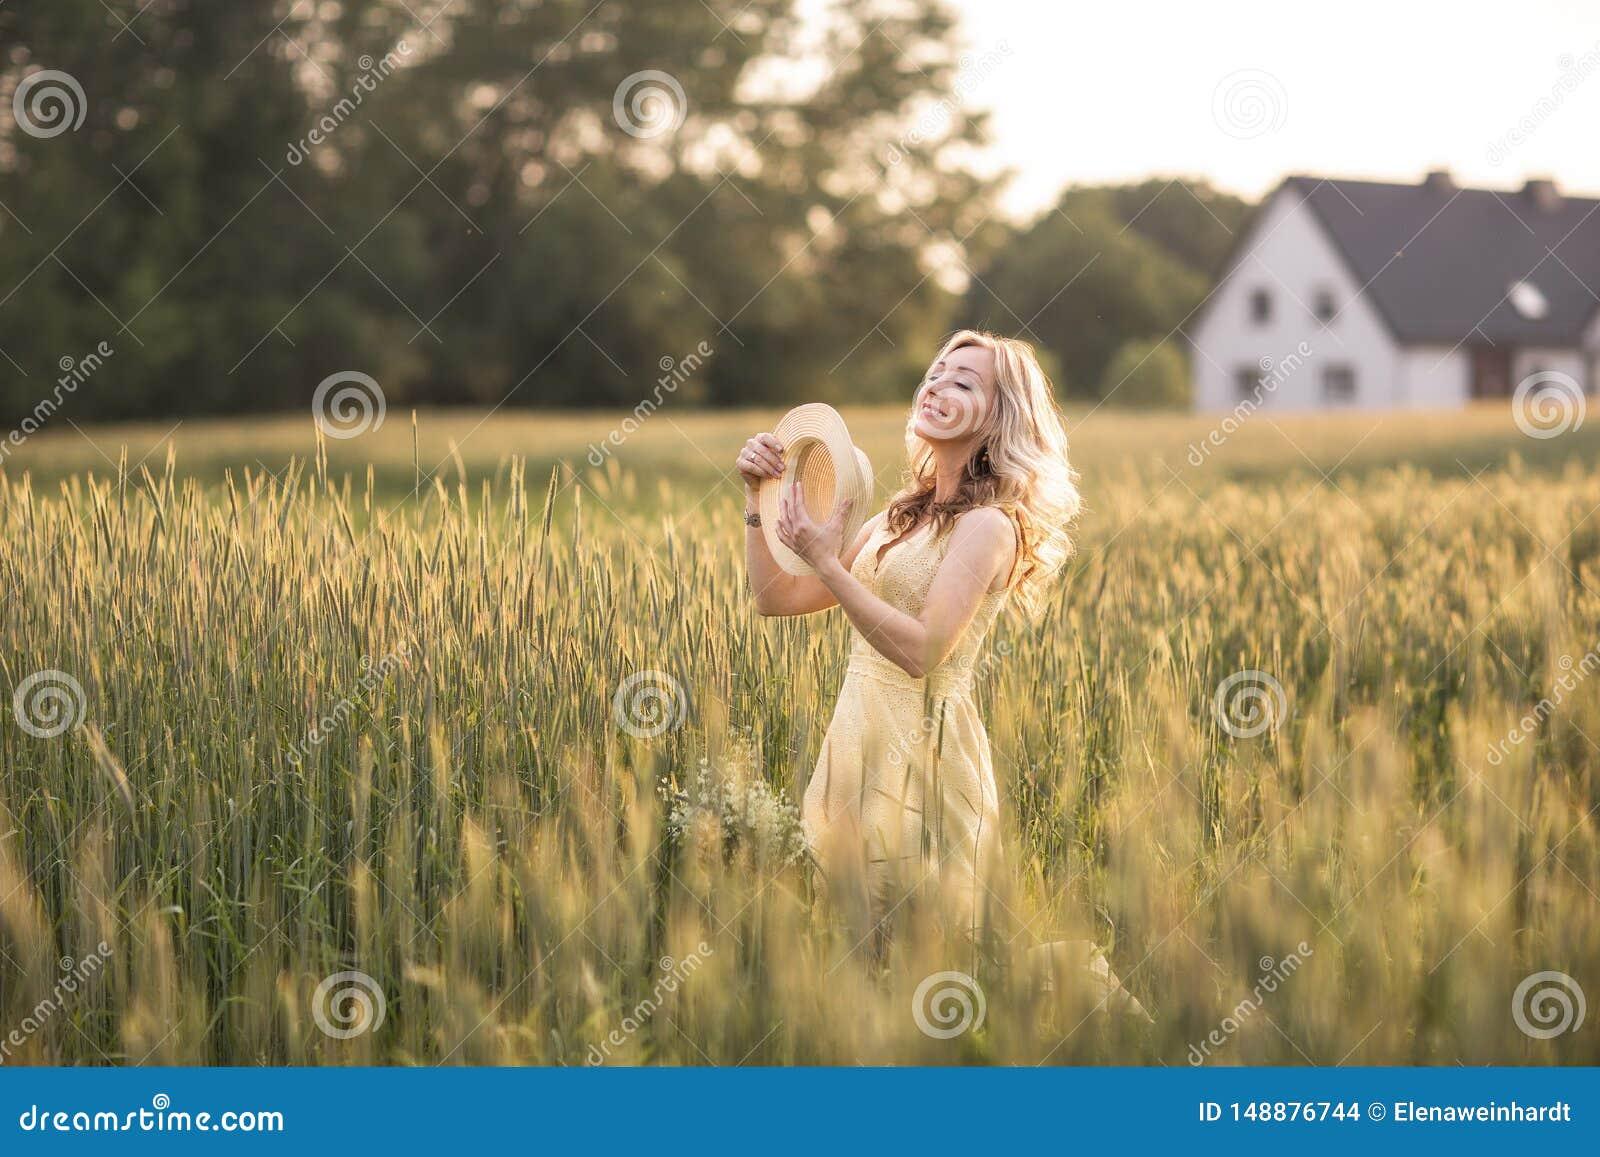 Solnedg?ng i sommar lantlig livstid En ung kvinna i f?ltet kastar en hatt Lantlig stil